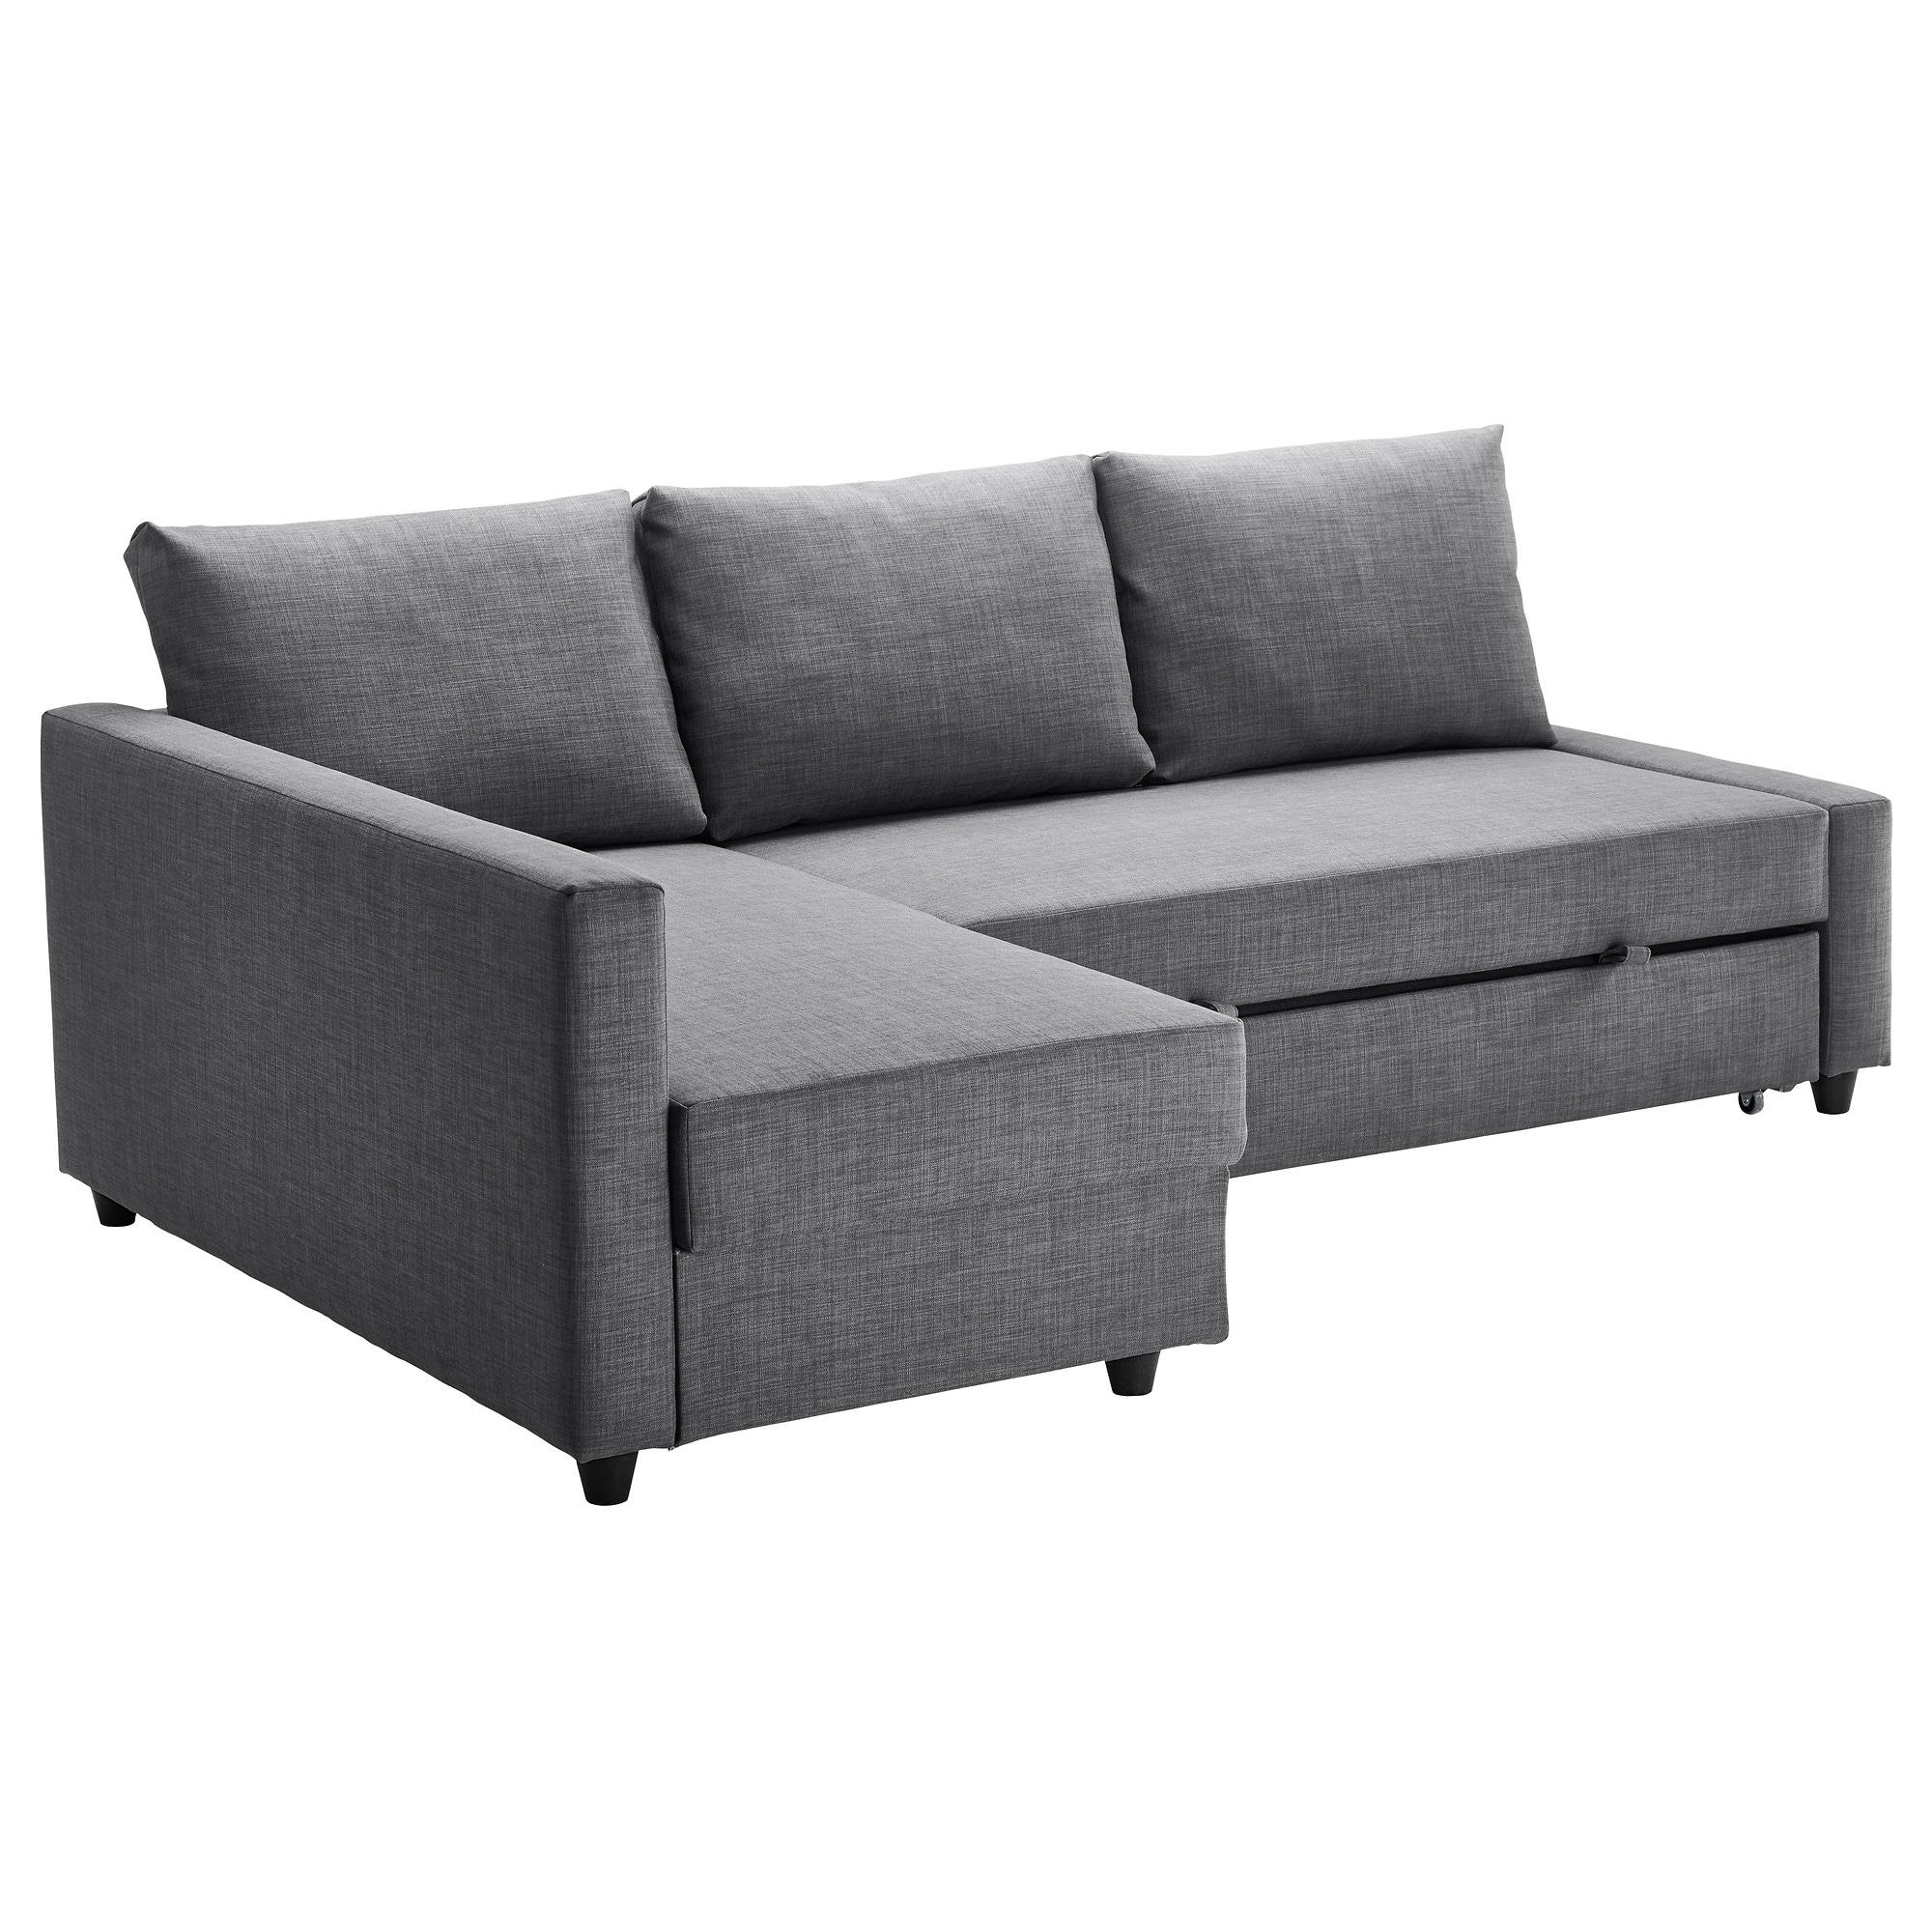 Sofas Y Sillones Ikea Budm sofà S Y Sillones Pra Online Ikea